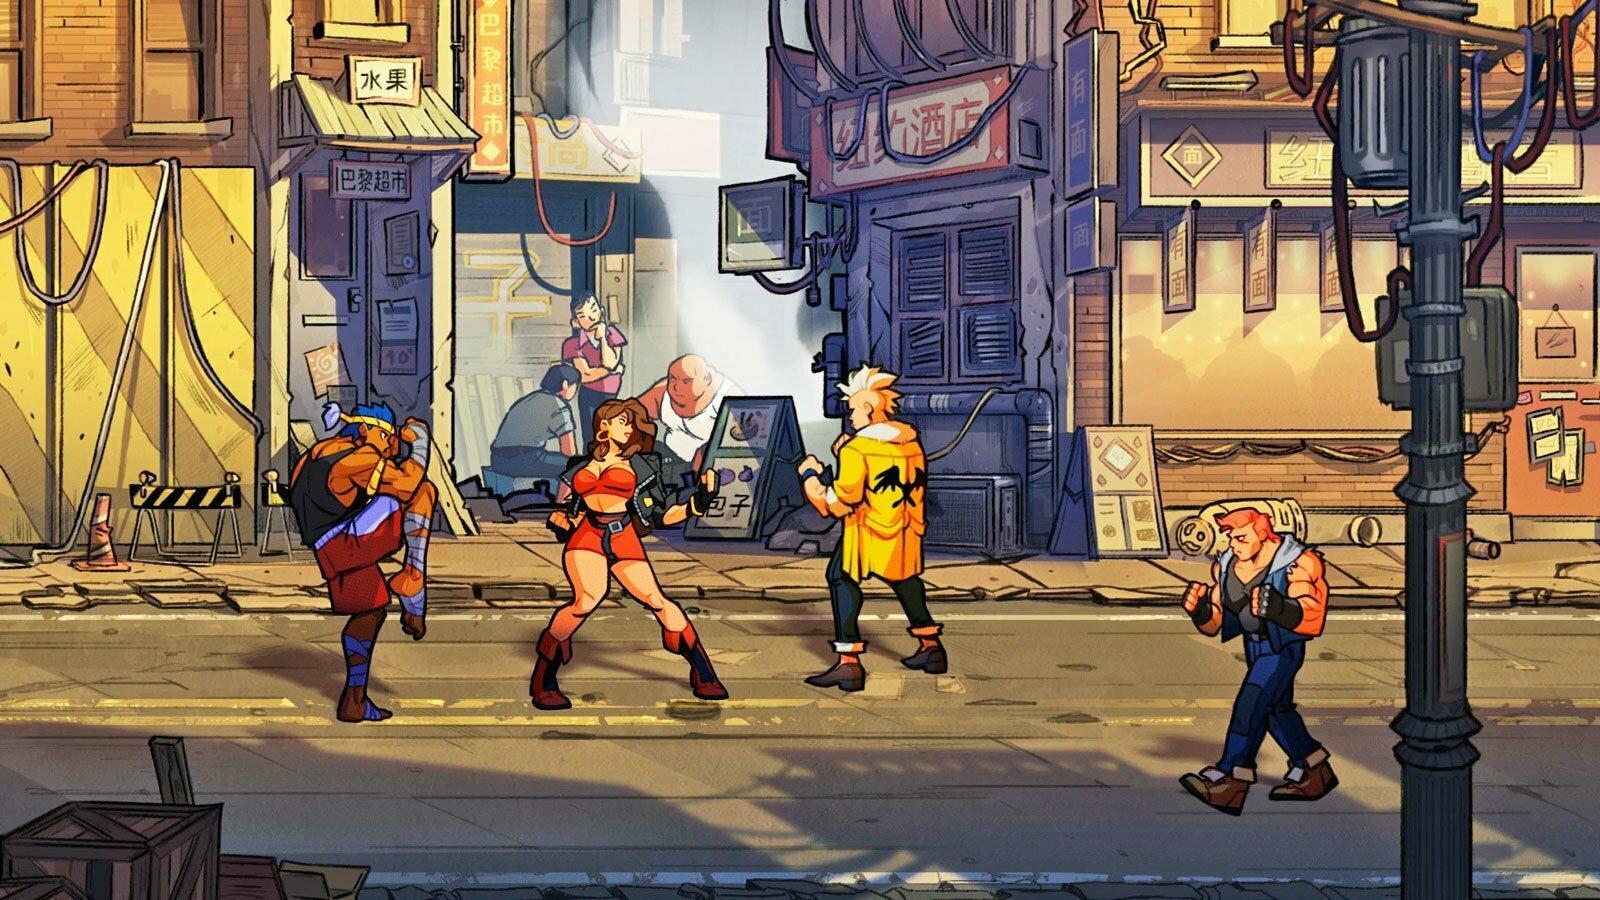 Street of Range 4 Novo jogo - Creditos: Guard Crush Games